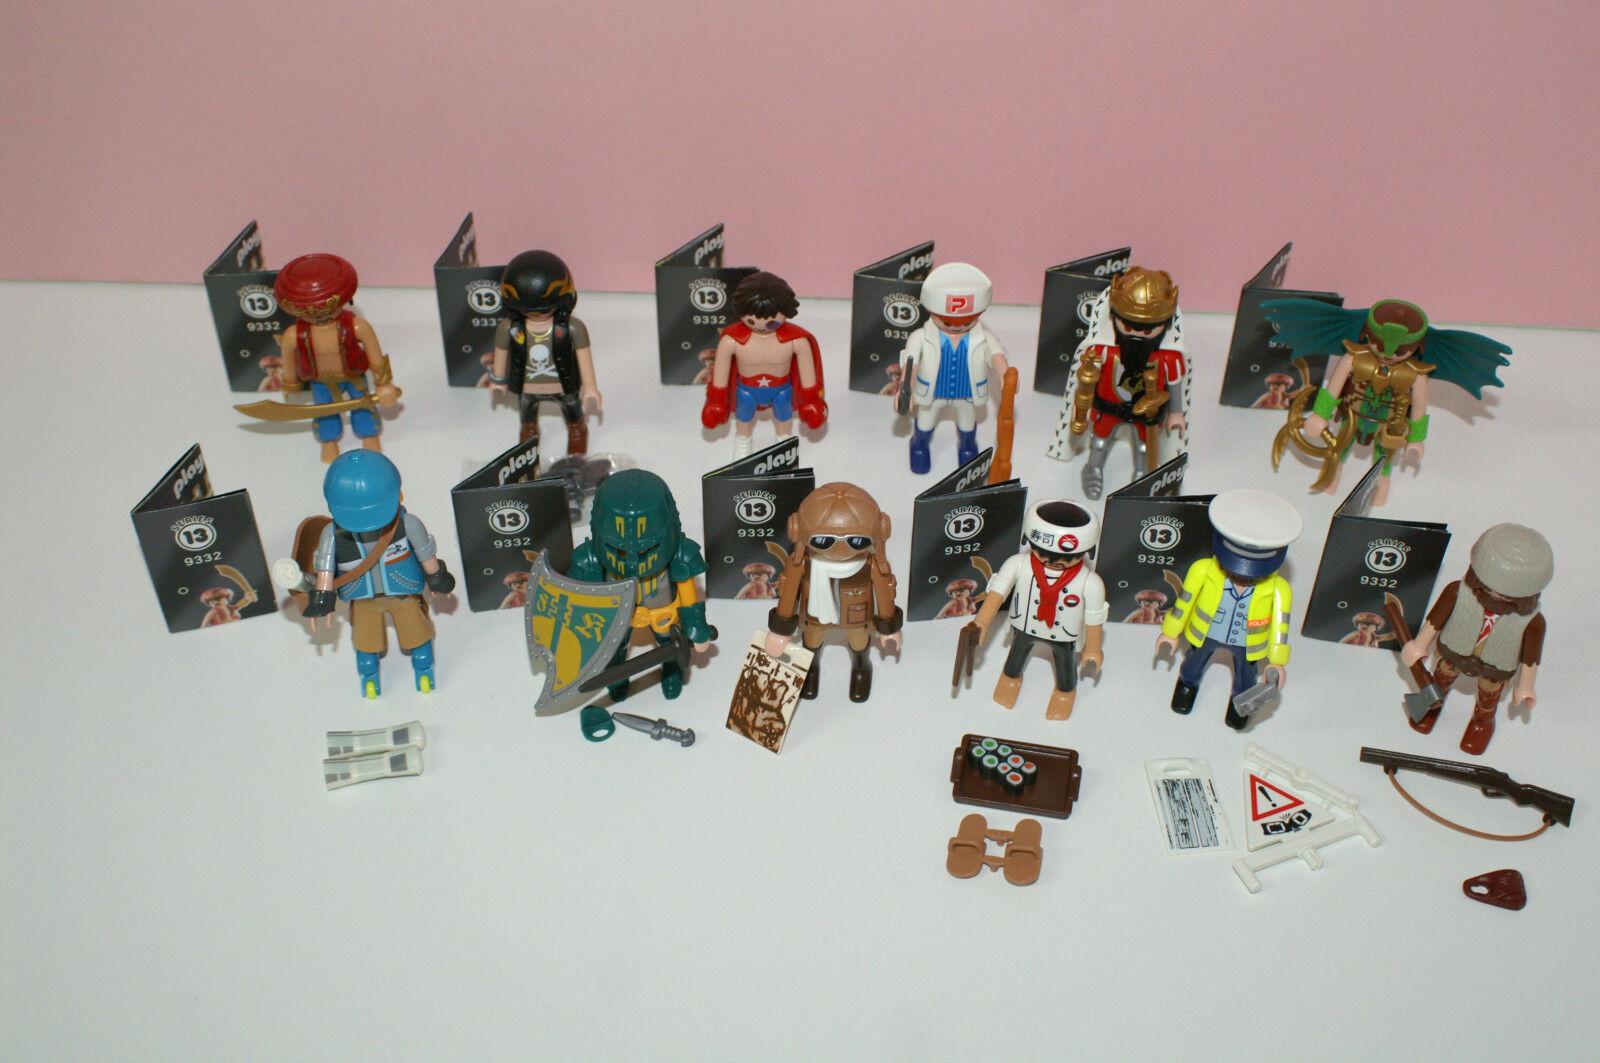 Playmobil 9332 Figures Boys Serie 13 alle 12 Figuren